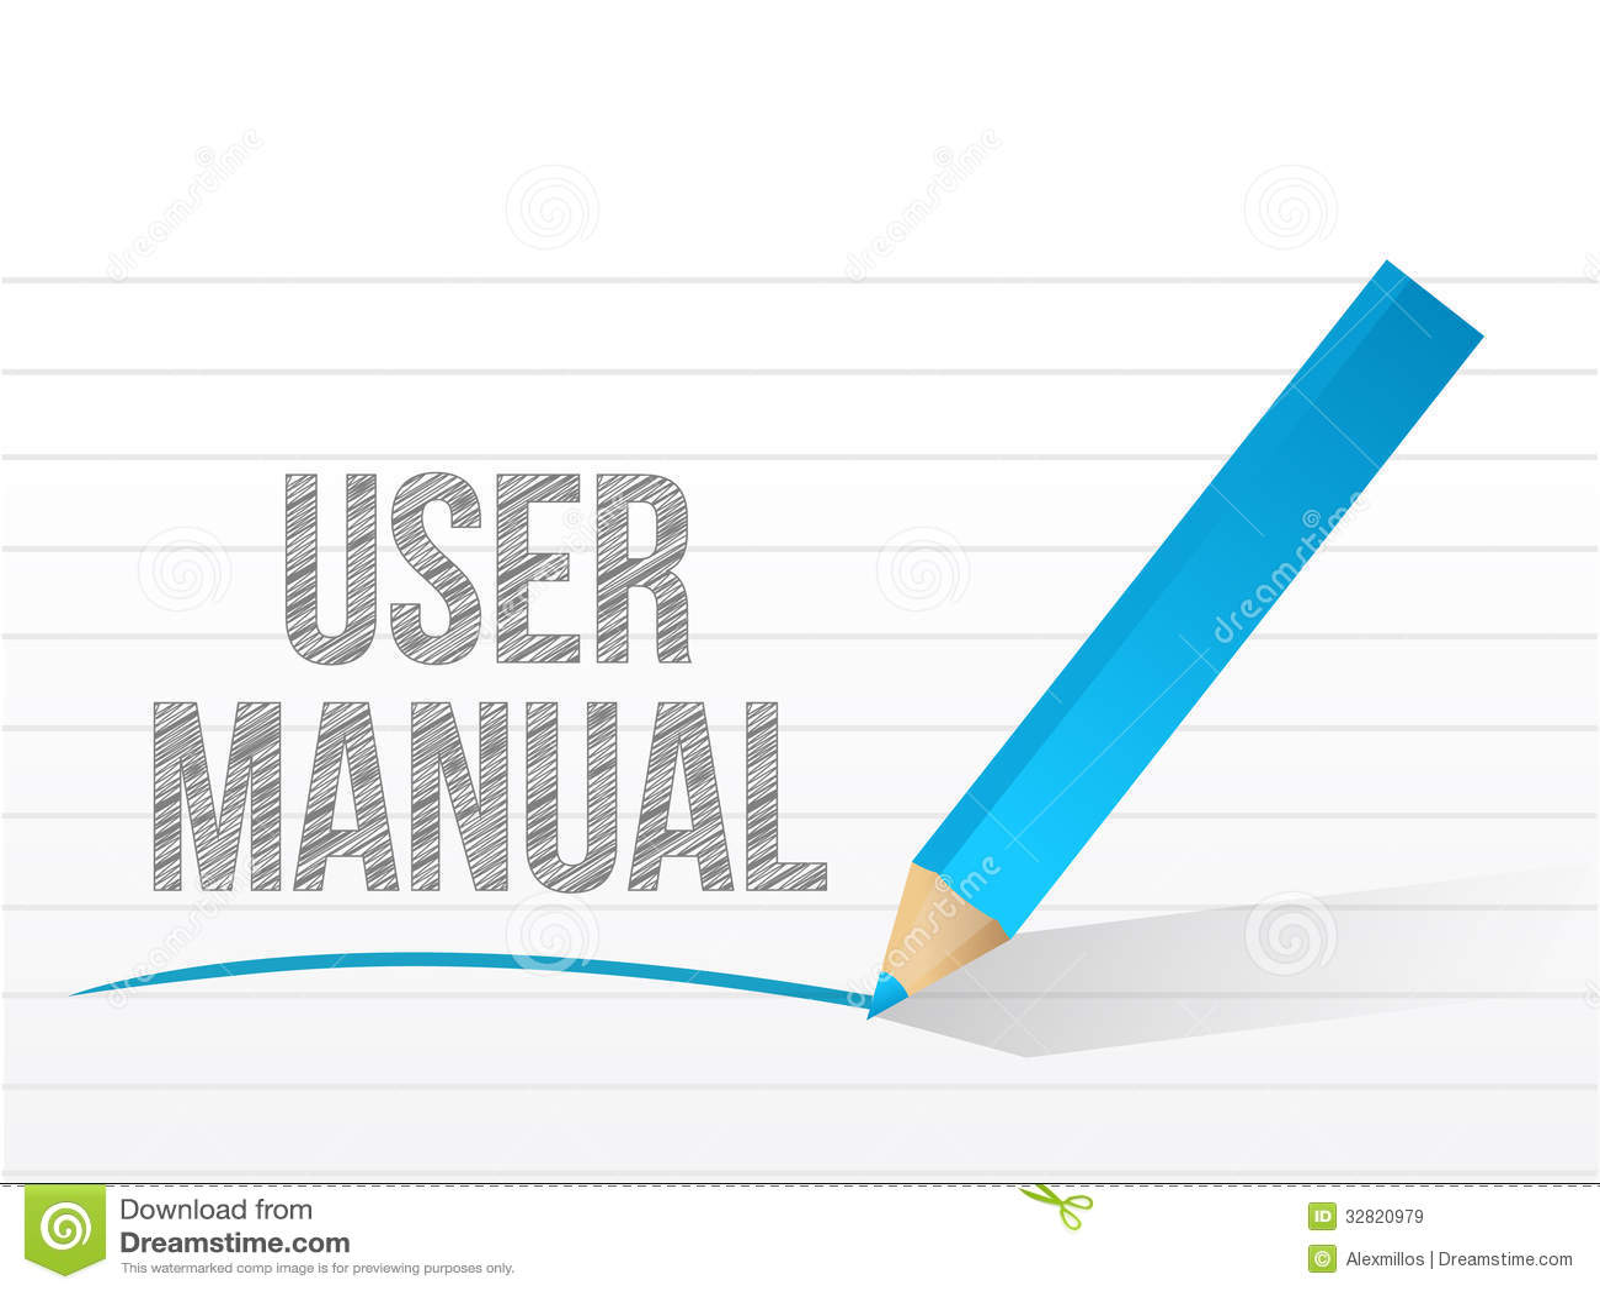 z line designs instruction manual